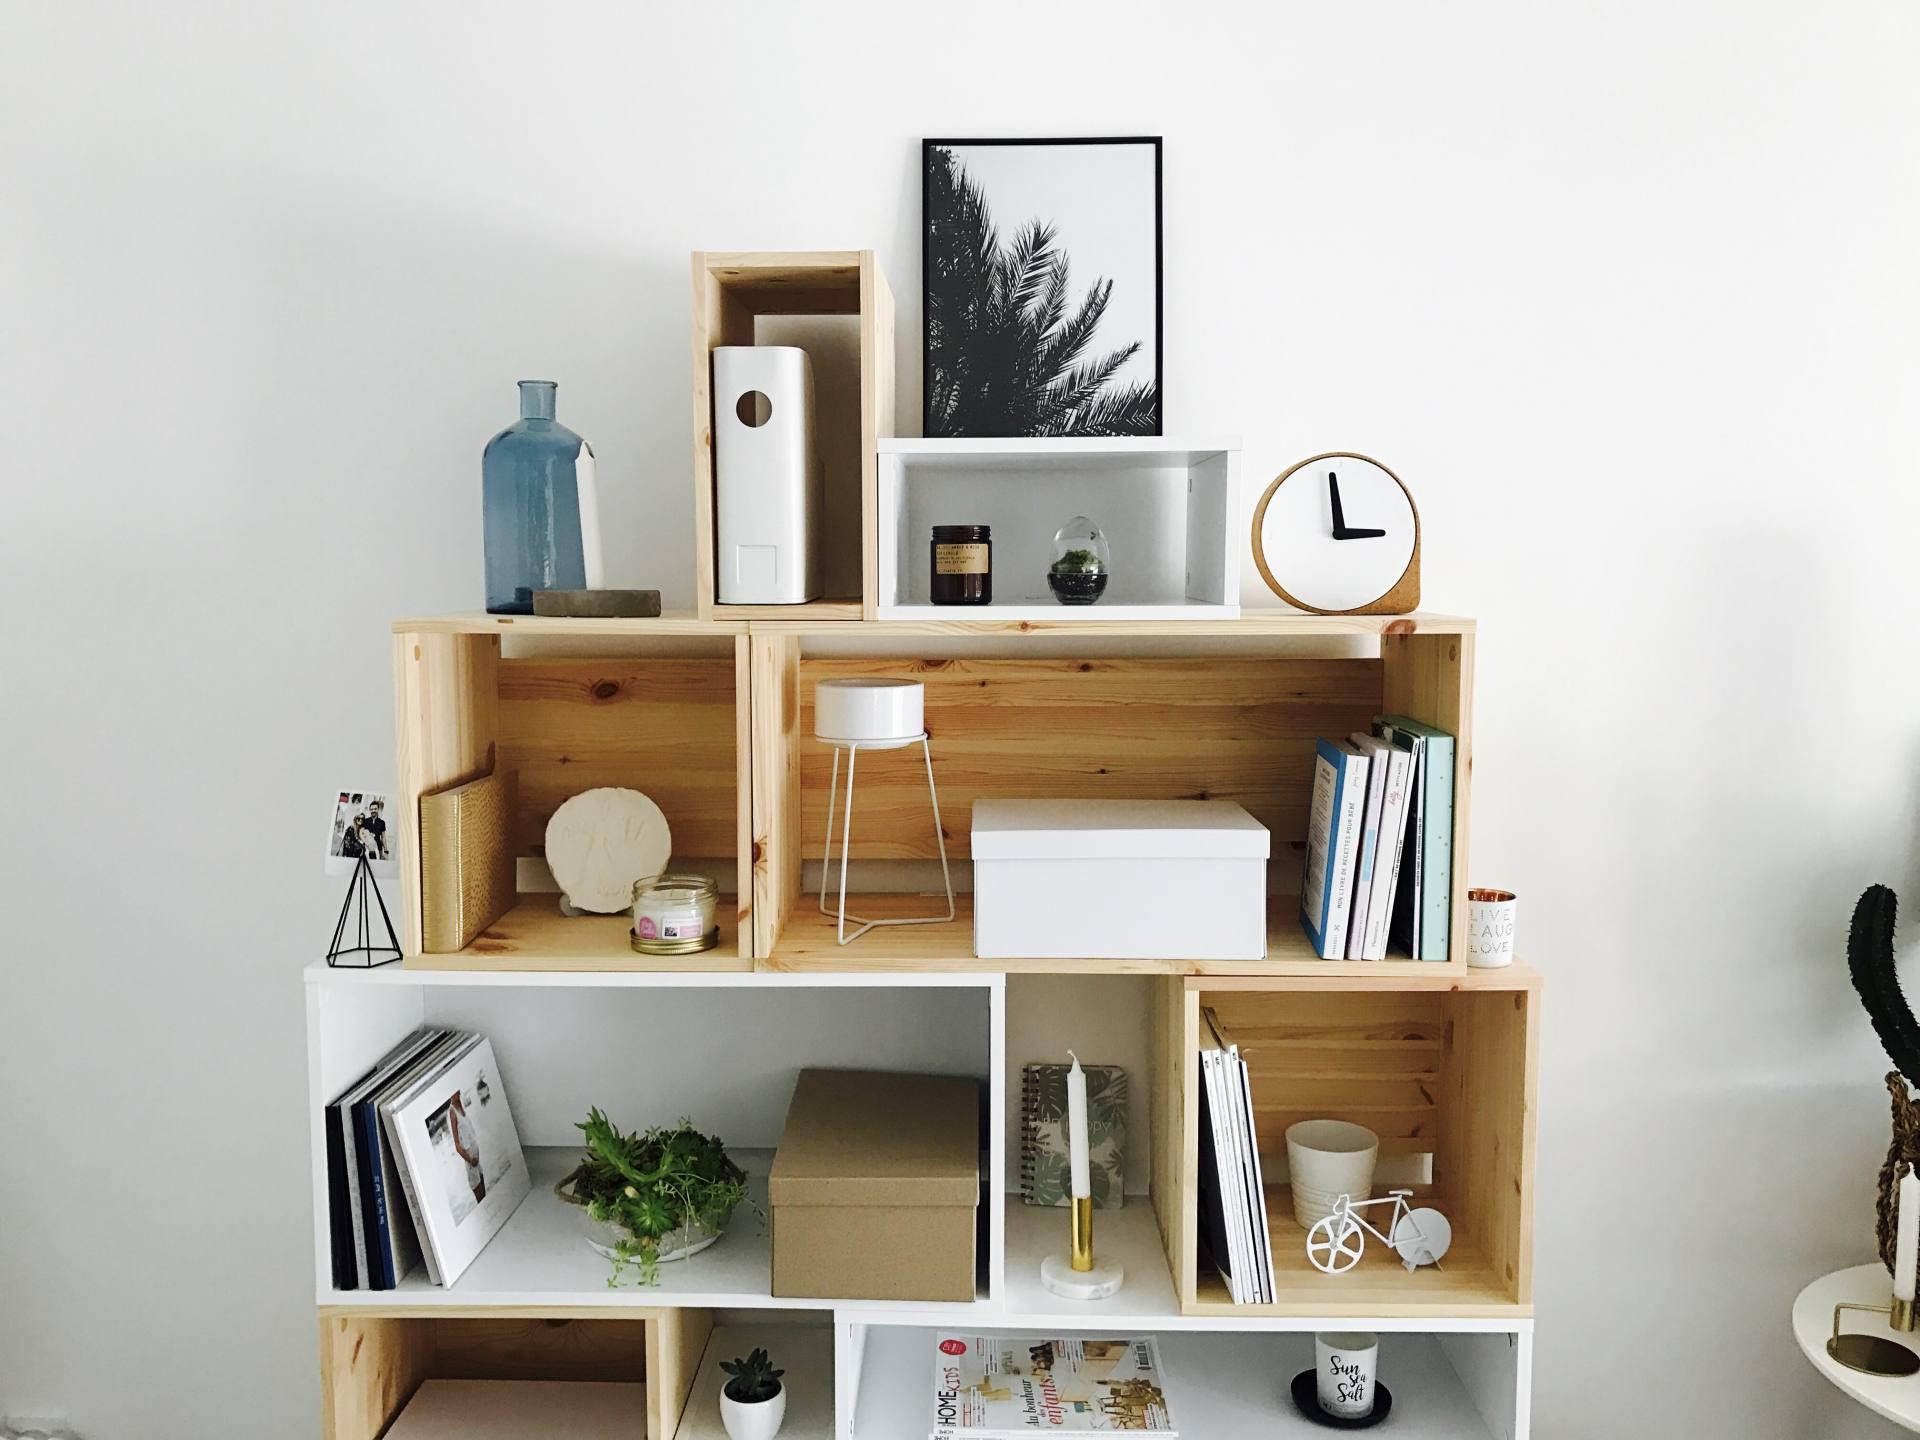 Creer un meuble scandinave soi m me juste maudinette - Juste un meuble ...